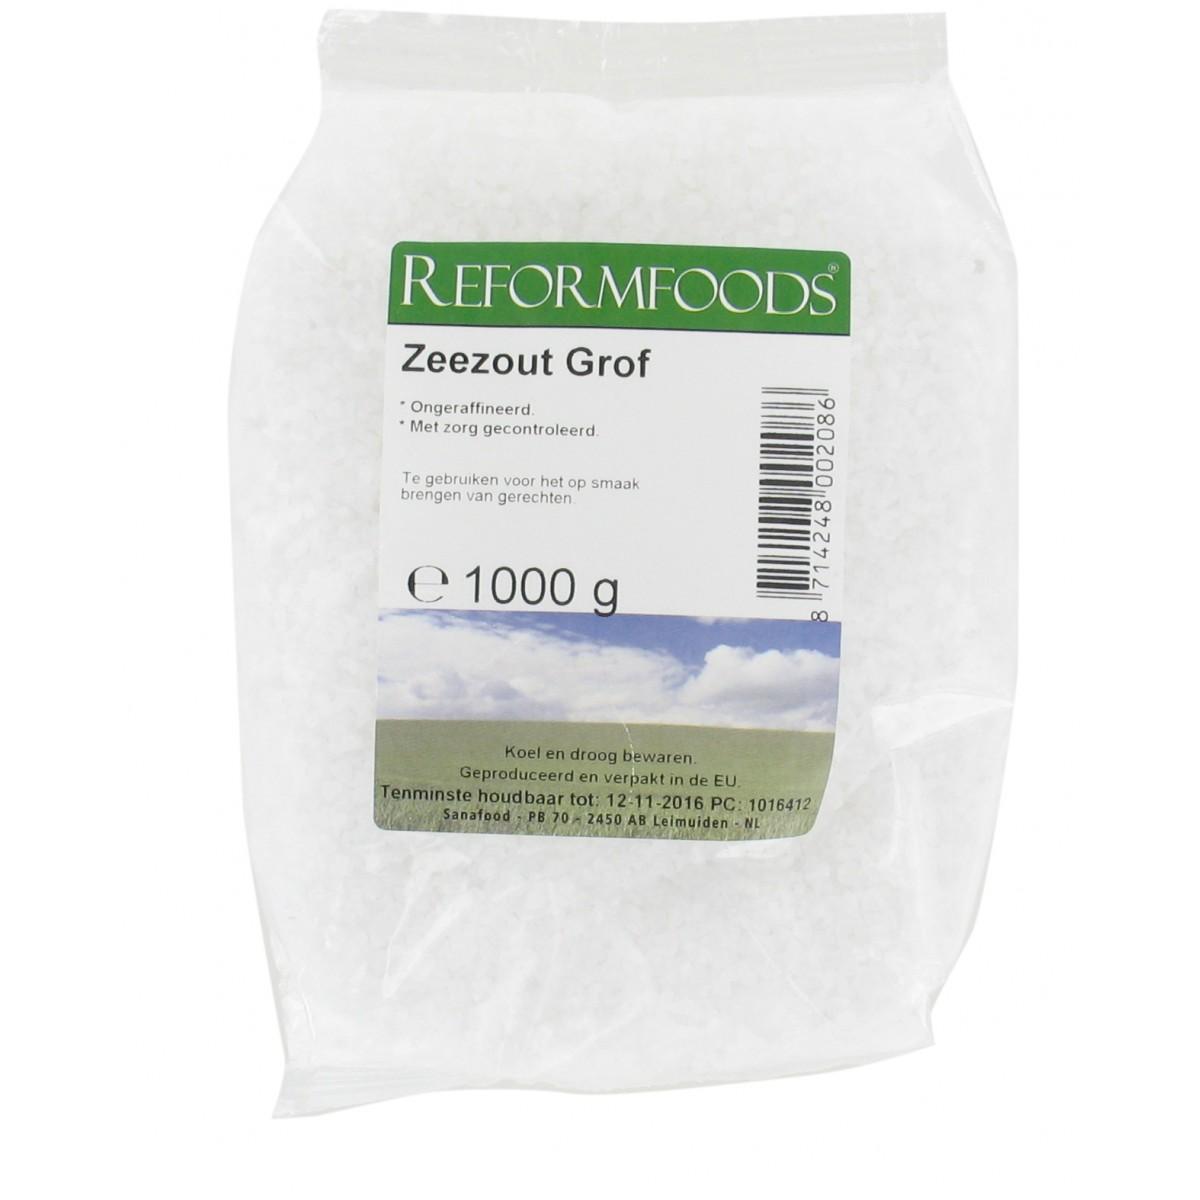 Zeezout Grof